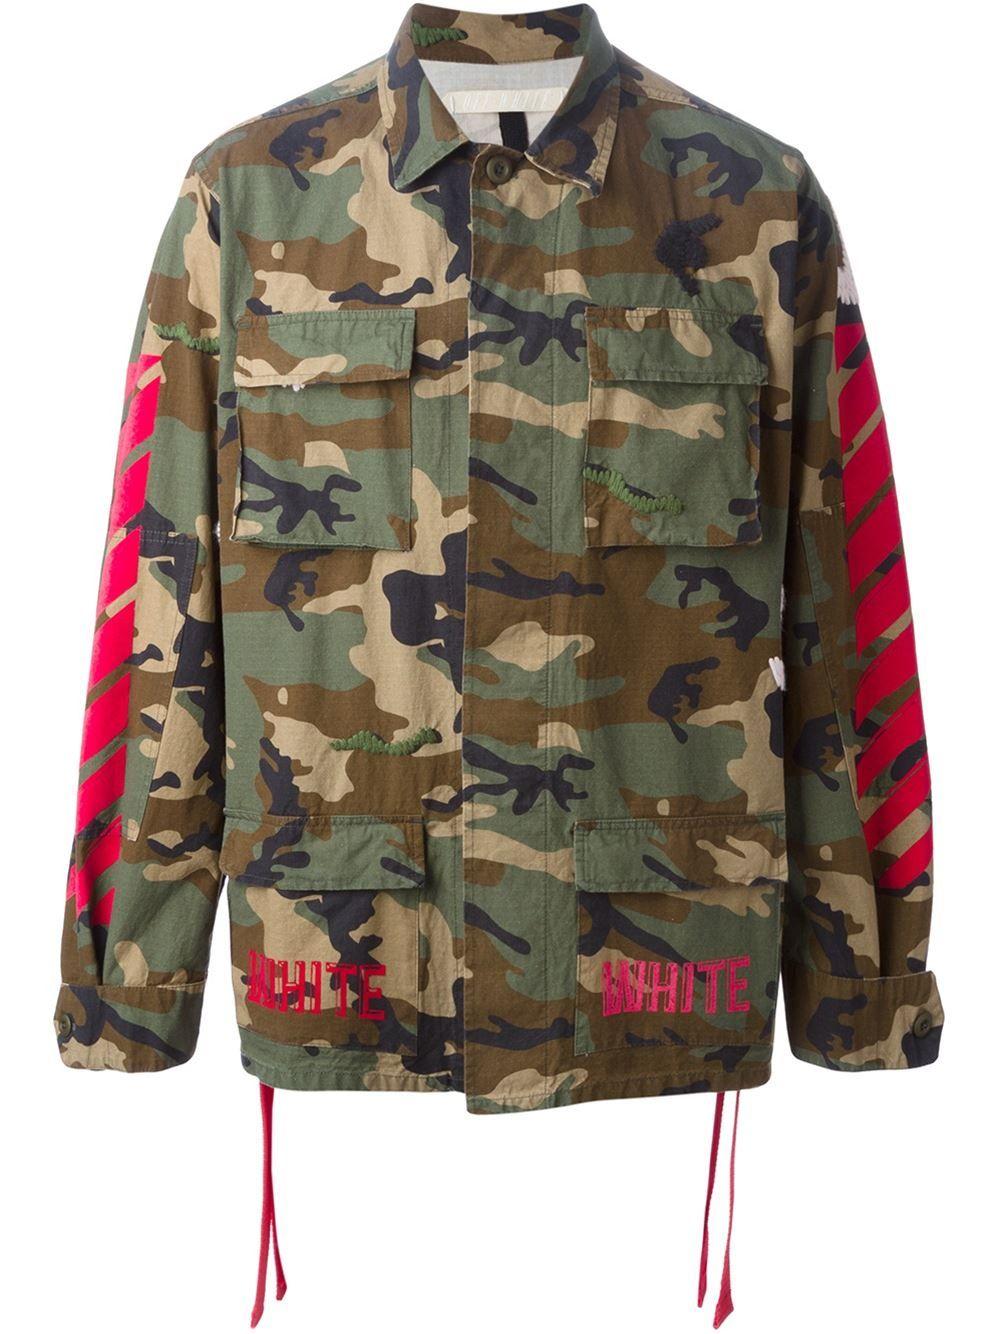 Camouflage Jacket Off White Hoodie Men Jackets [ 1334 x 1000 Pixel ]